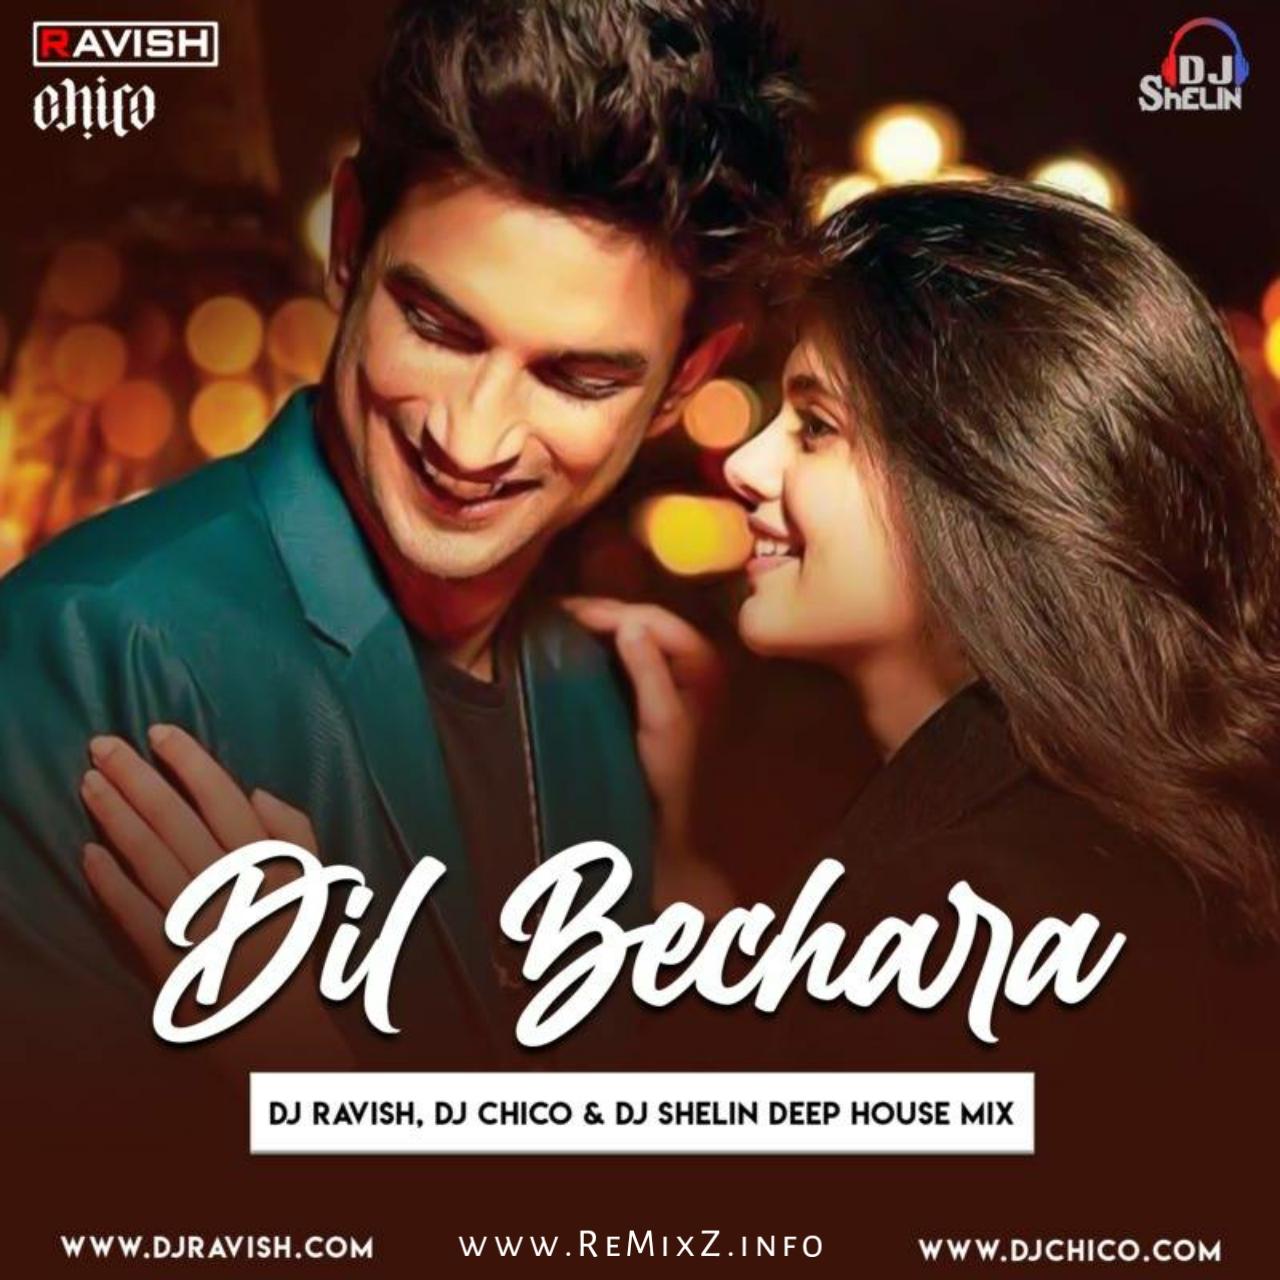 dil-bechara-deep-house-mix-dj-ravish-dj-chico